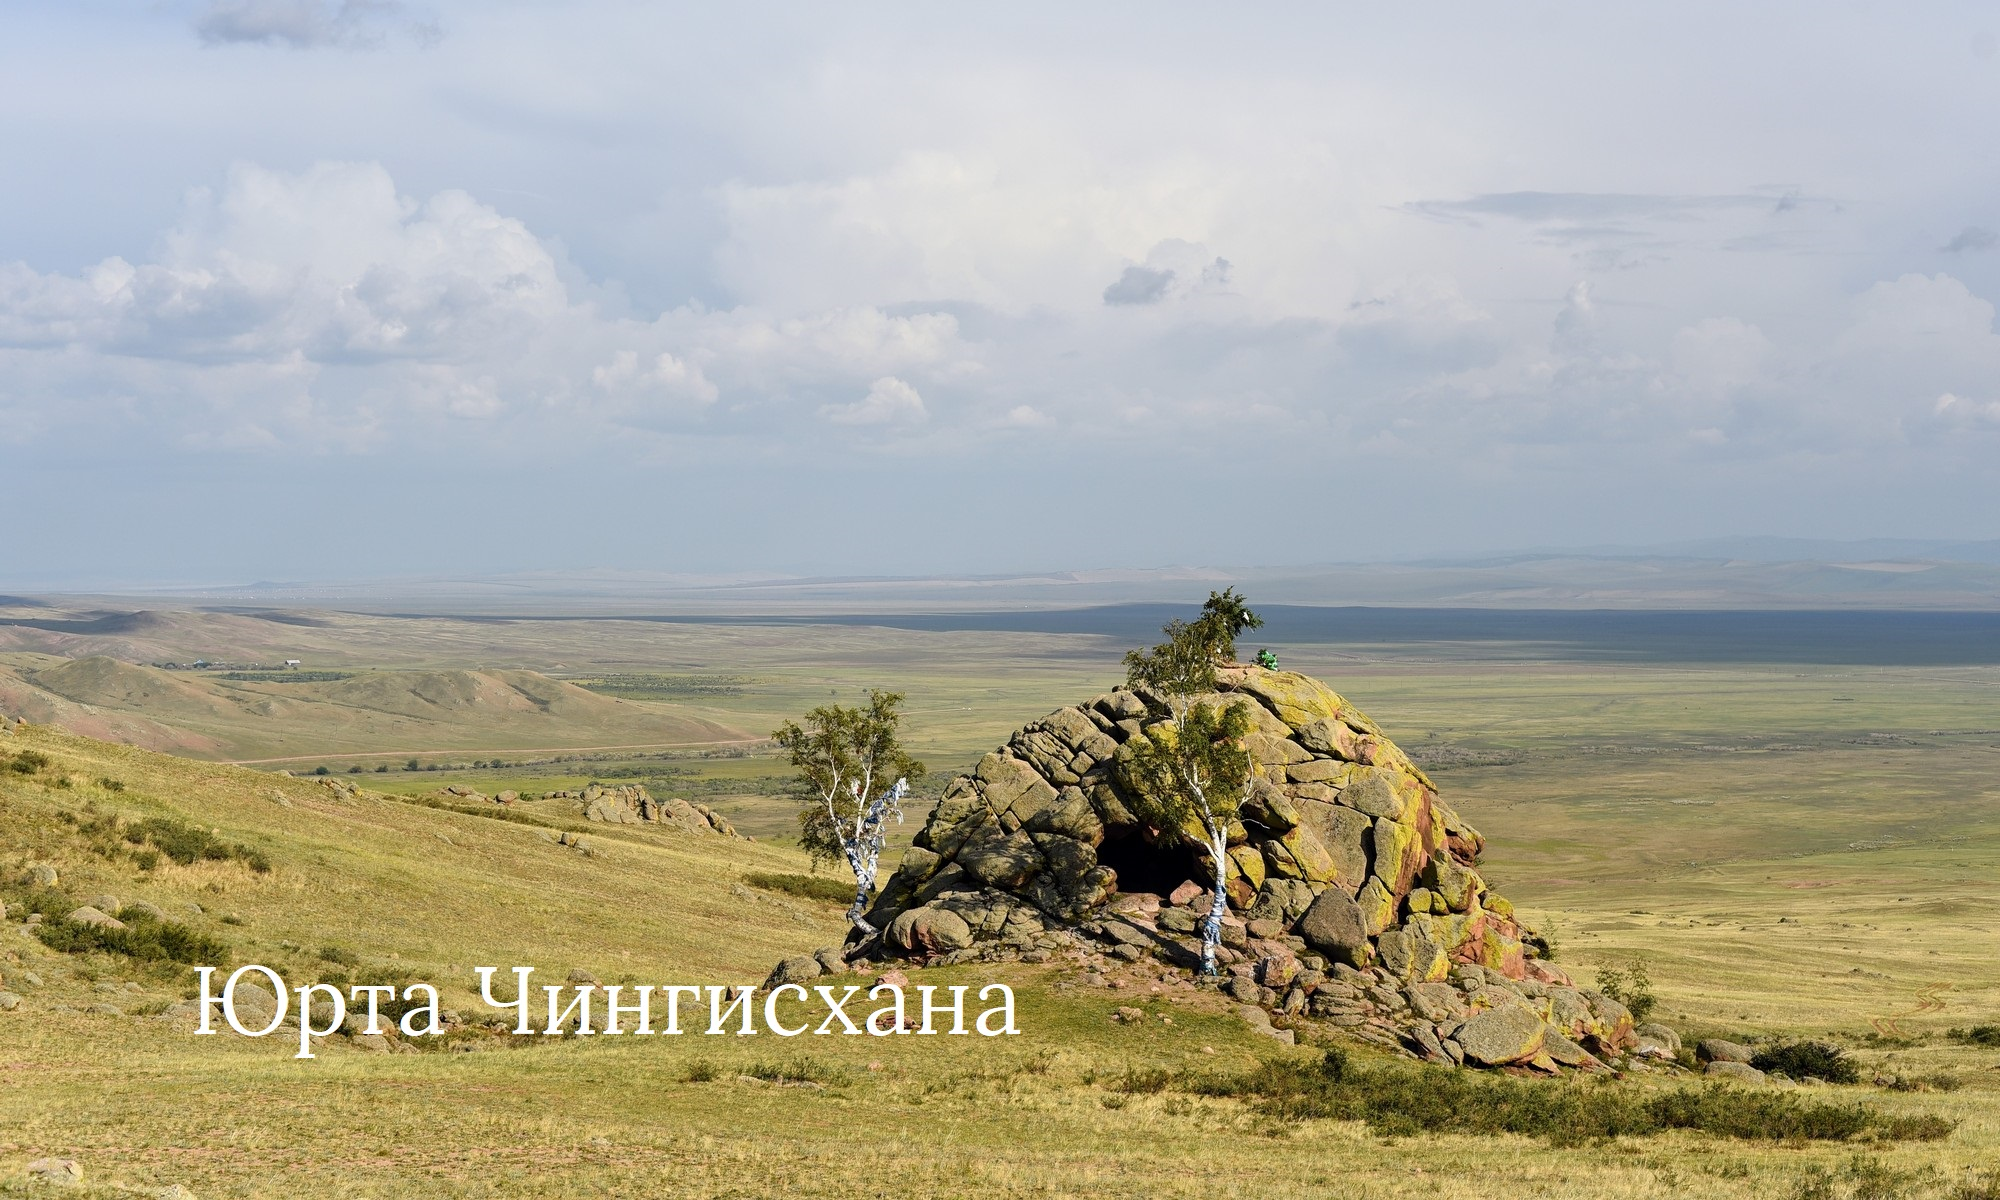 Юрта Чингисхана в Мухоршибирском районе Бурятии